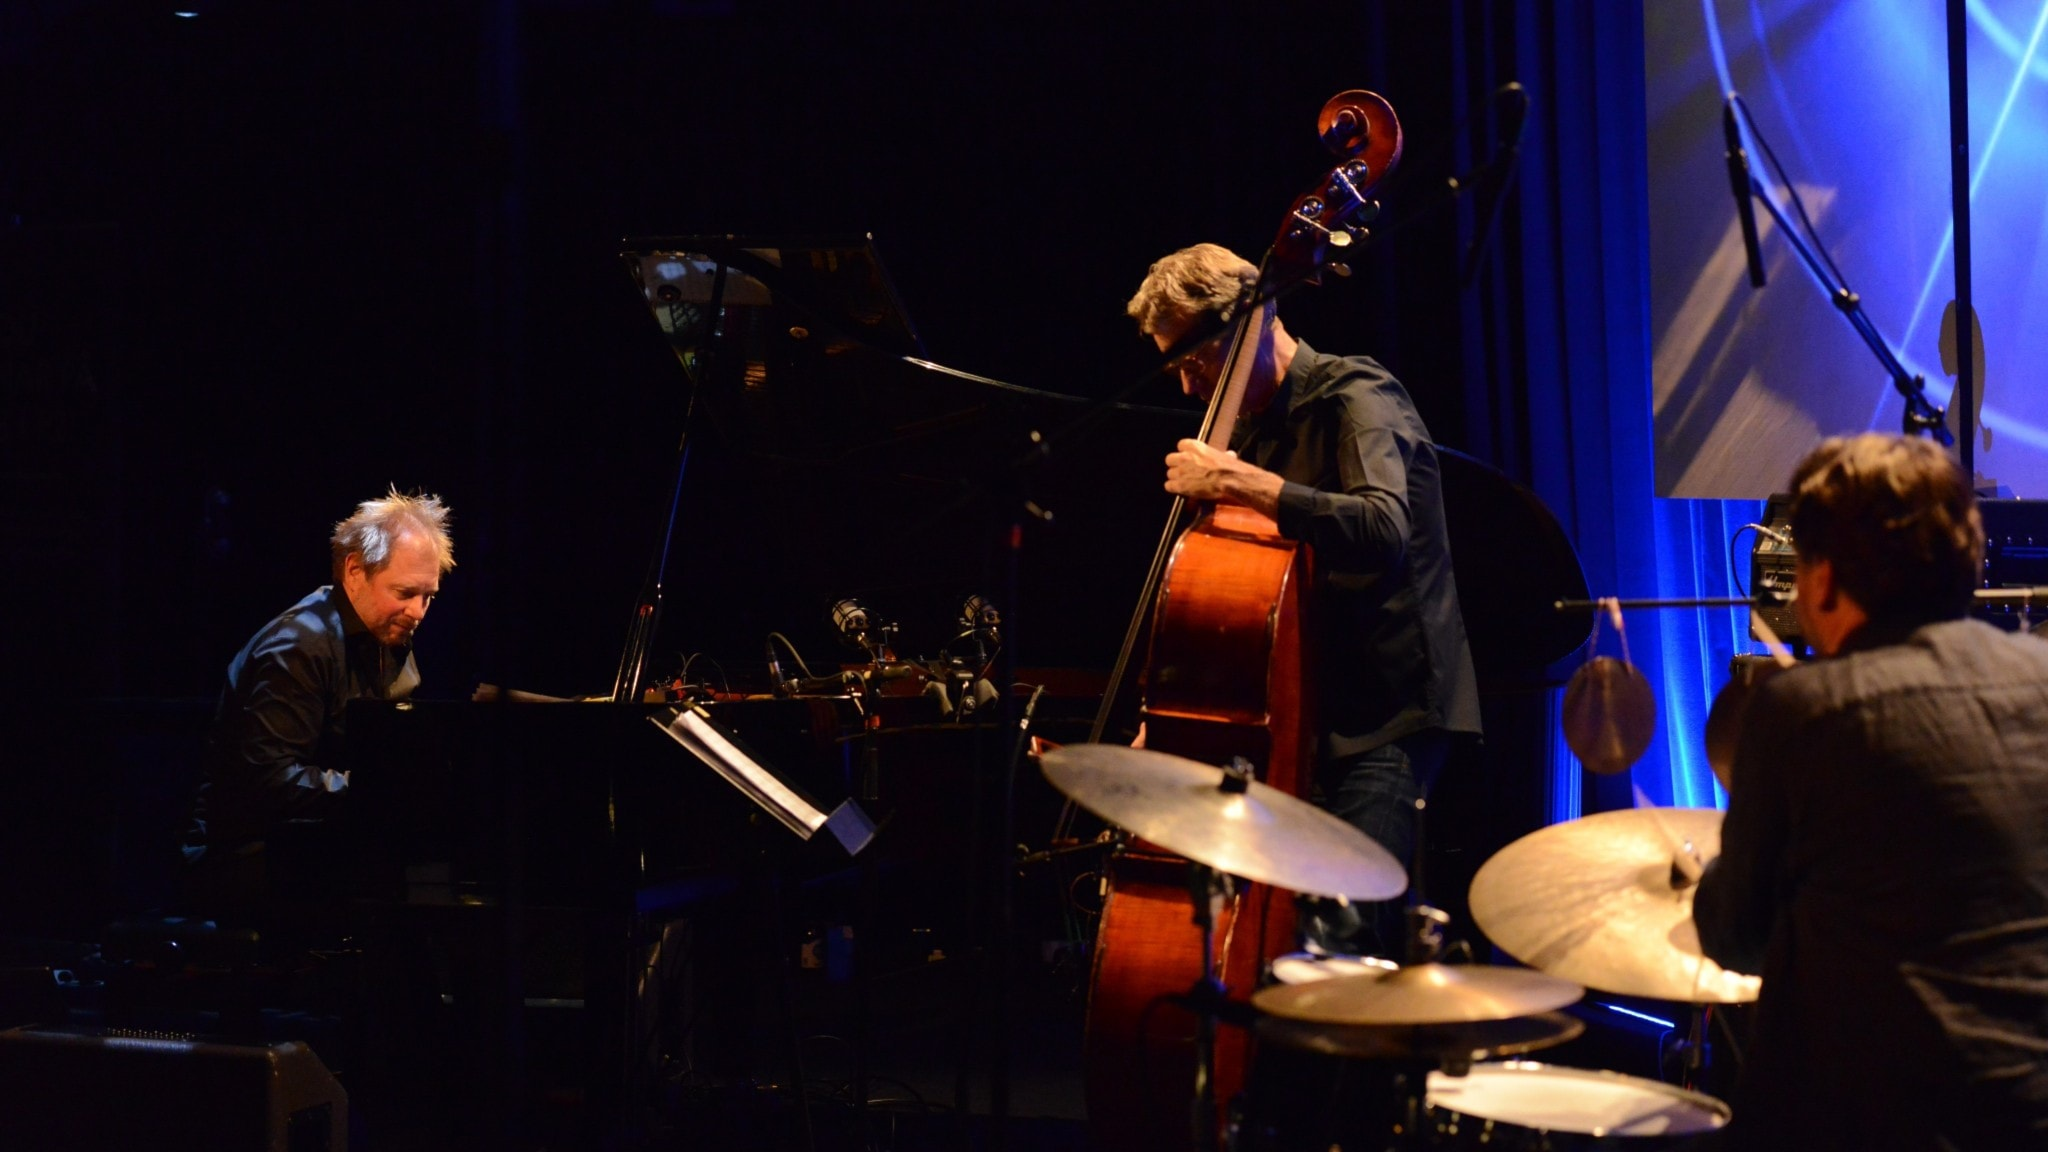 KONSERT: Daniel Karlsson trio på Umeå jazzfestival